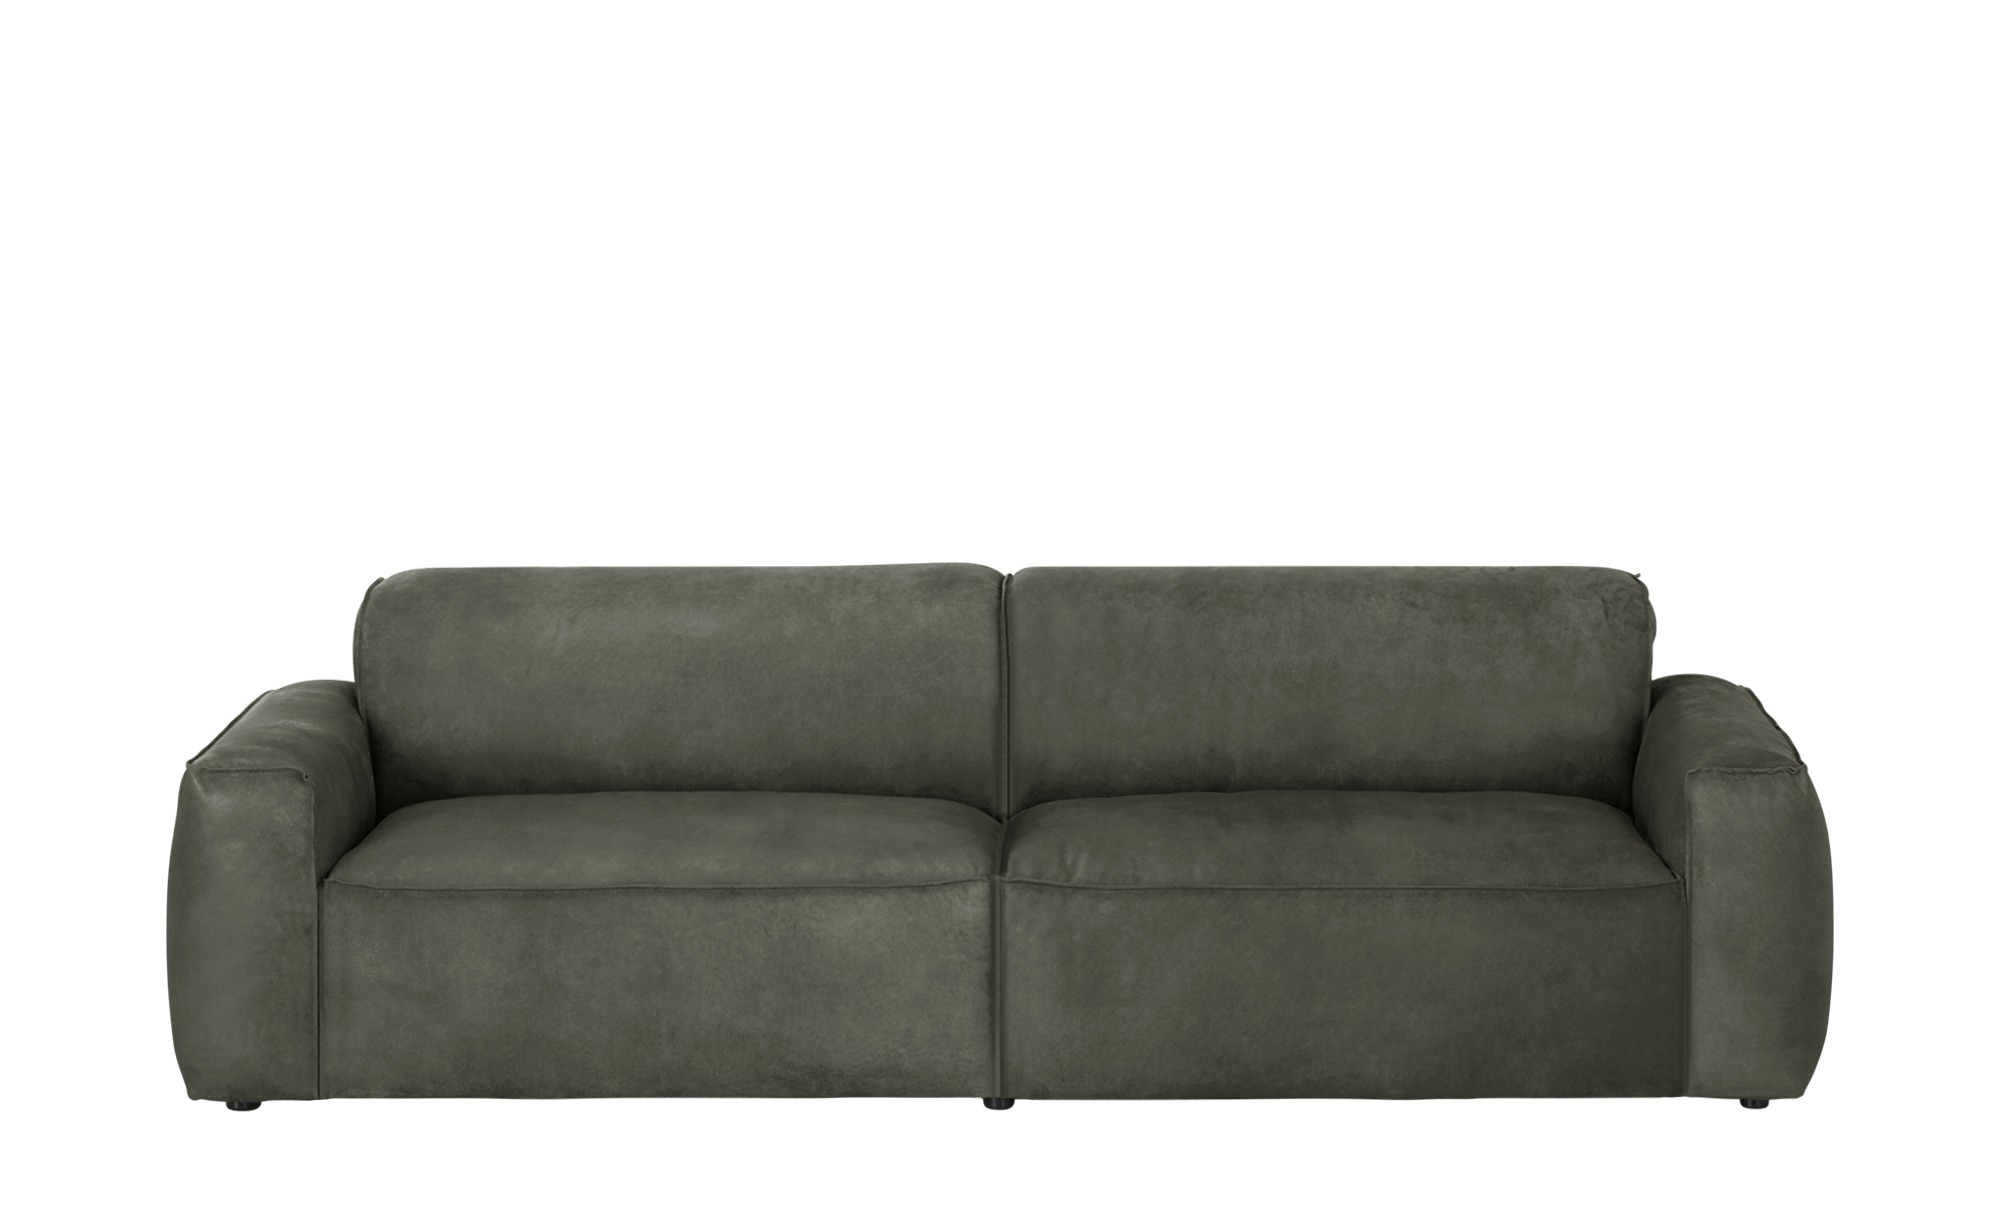 Gray & Jones Ledersofa  Black Coast Factory ¦ grau ¦ Maße (cm): B: 260 H: 75 T: 95 Polstermöbel > Sofas > Einzelsofas - Höffner